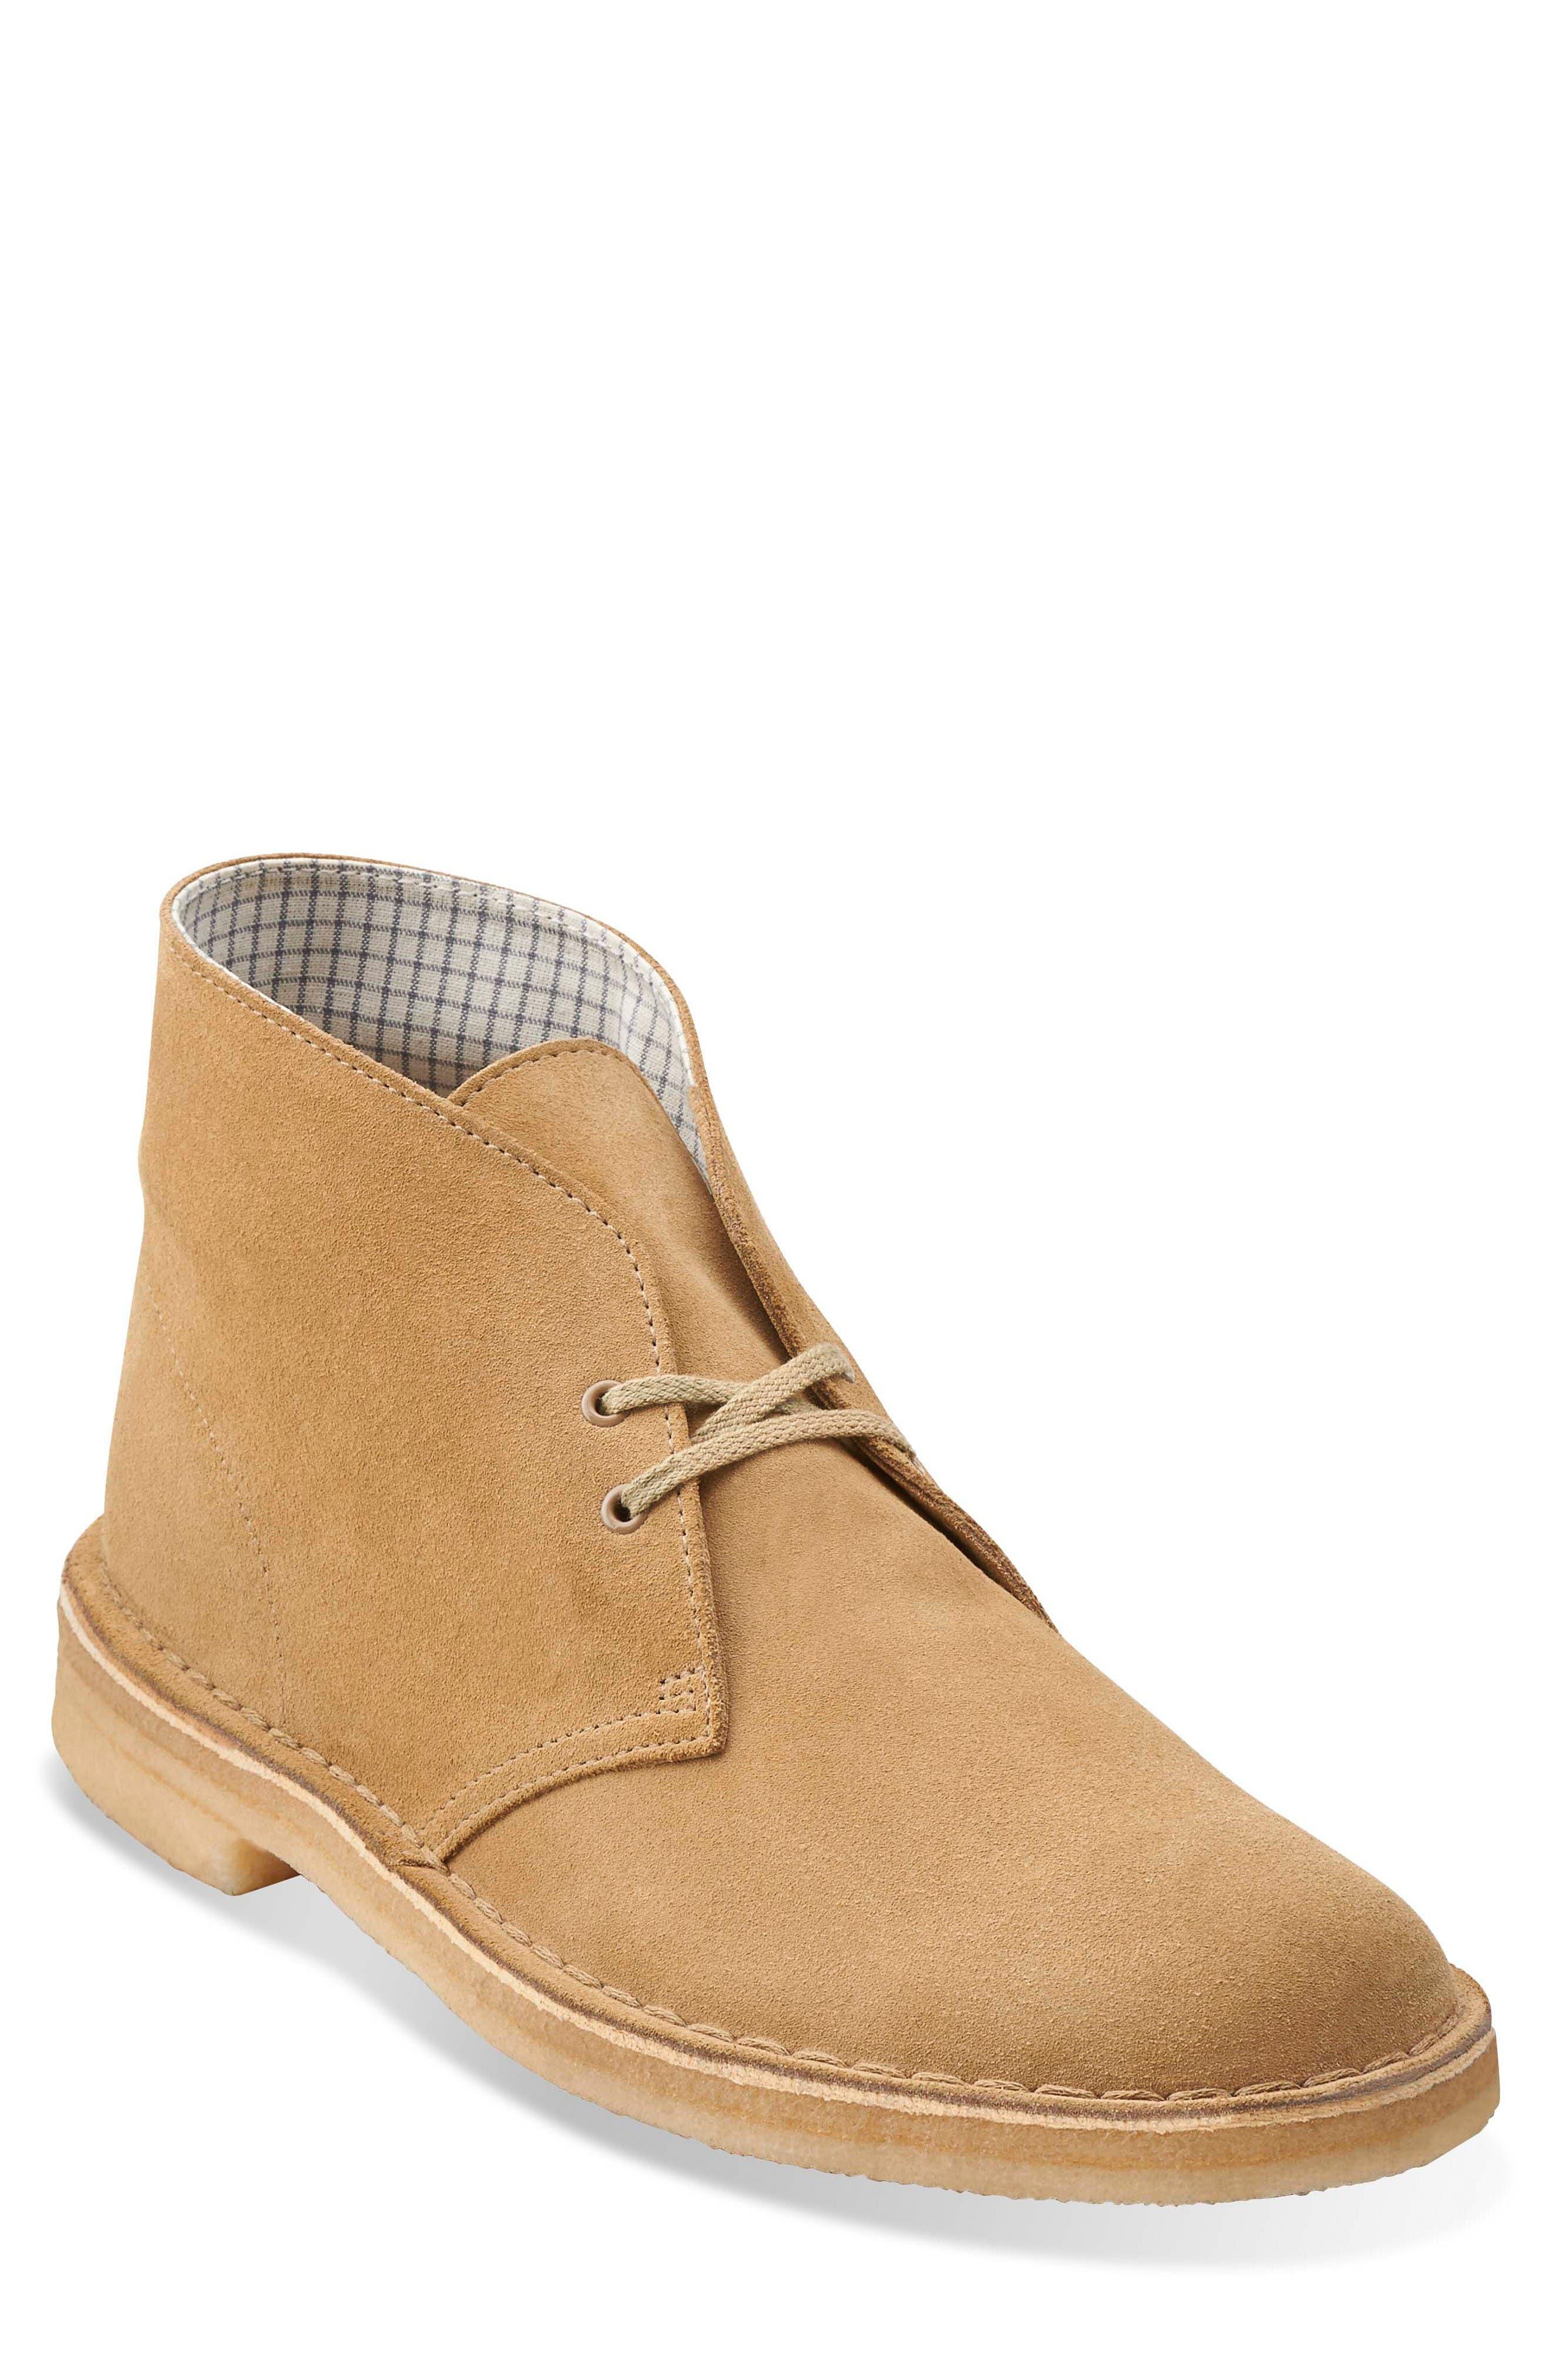 Alternate Image 2  - Clarks® Originals 'Desert' Boot (Men)